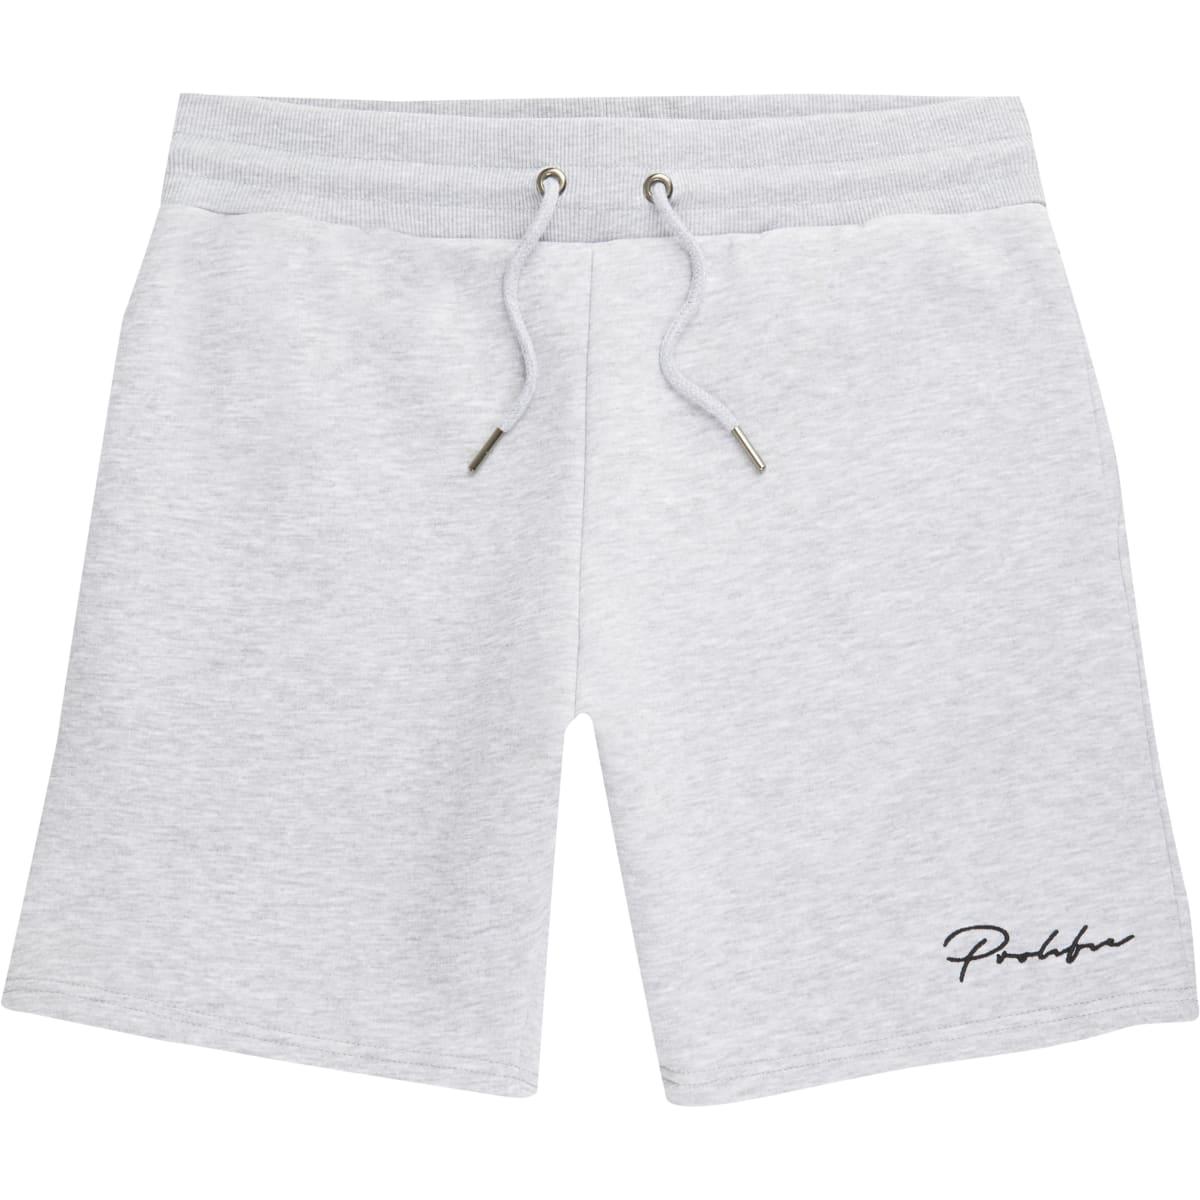 Prolific - Grijze gemêleerde slim-fit short